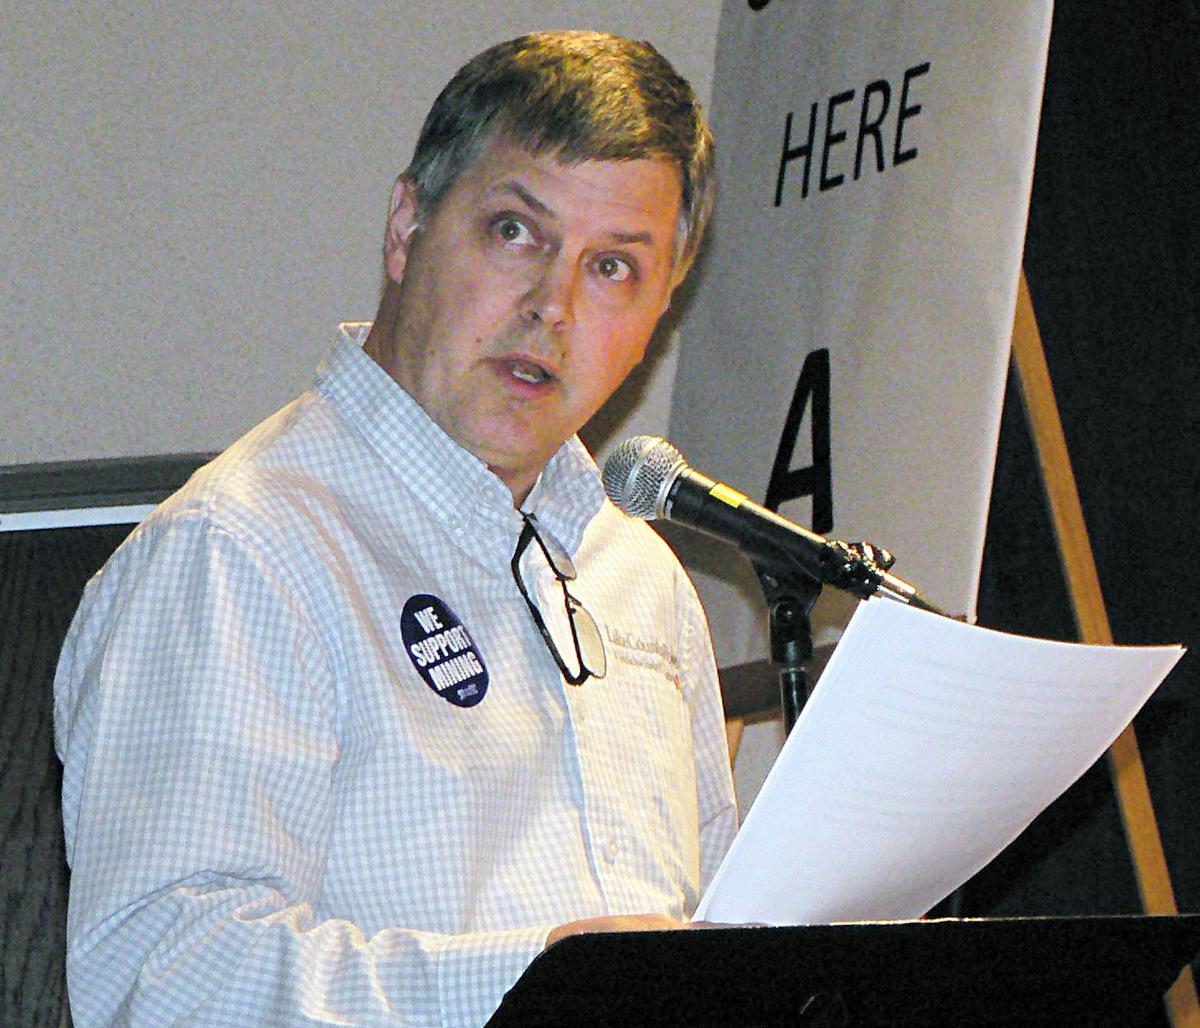 Hearing reignites fiery debate over nonferrous mining